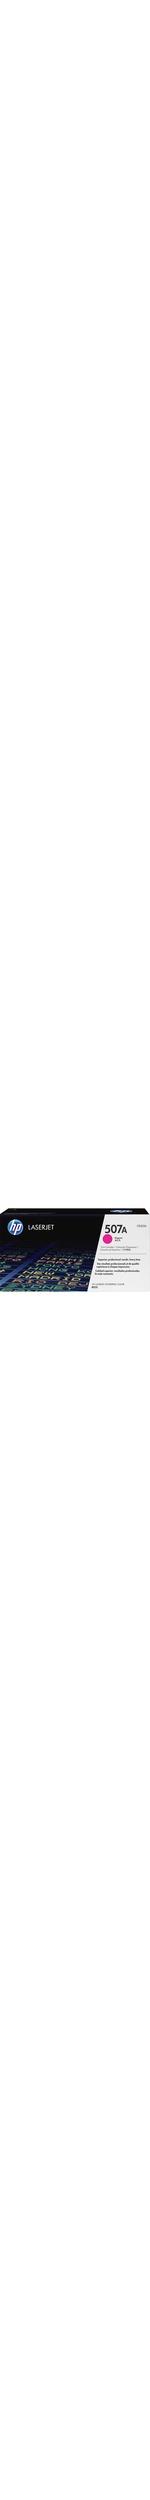 HP 507A Toner Cartridge - Magenta - Laser - 6000 Page - 1 Pack